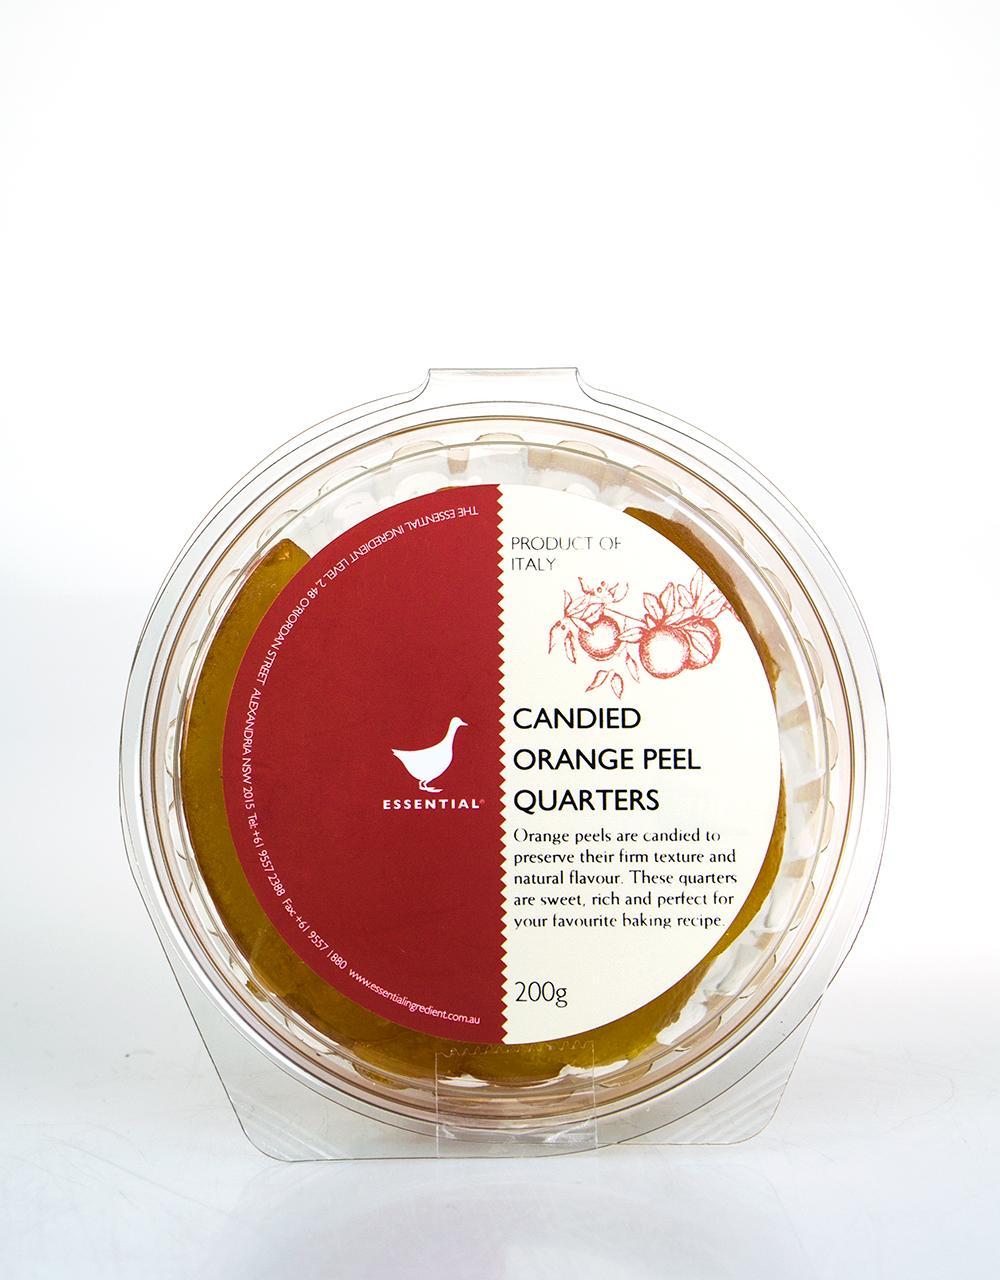 Candied Orange Peel Quarters The Essential Ingredient 200g